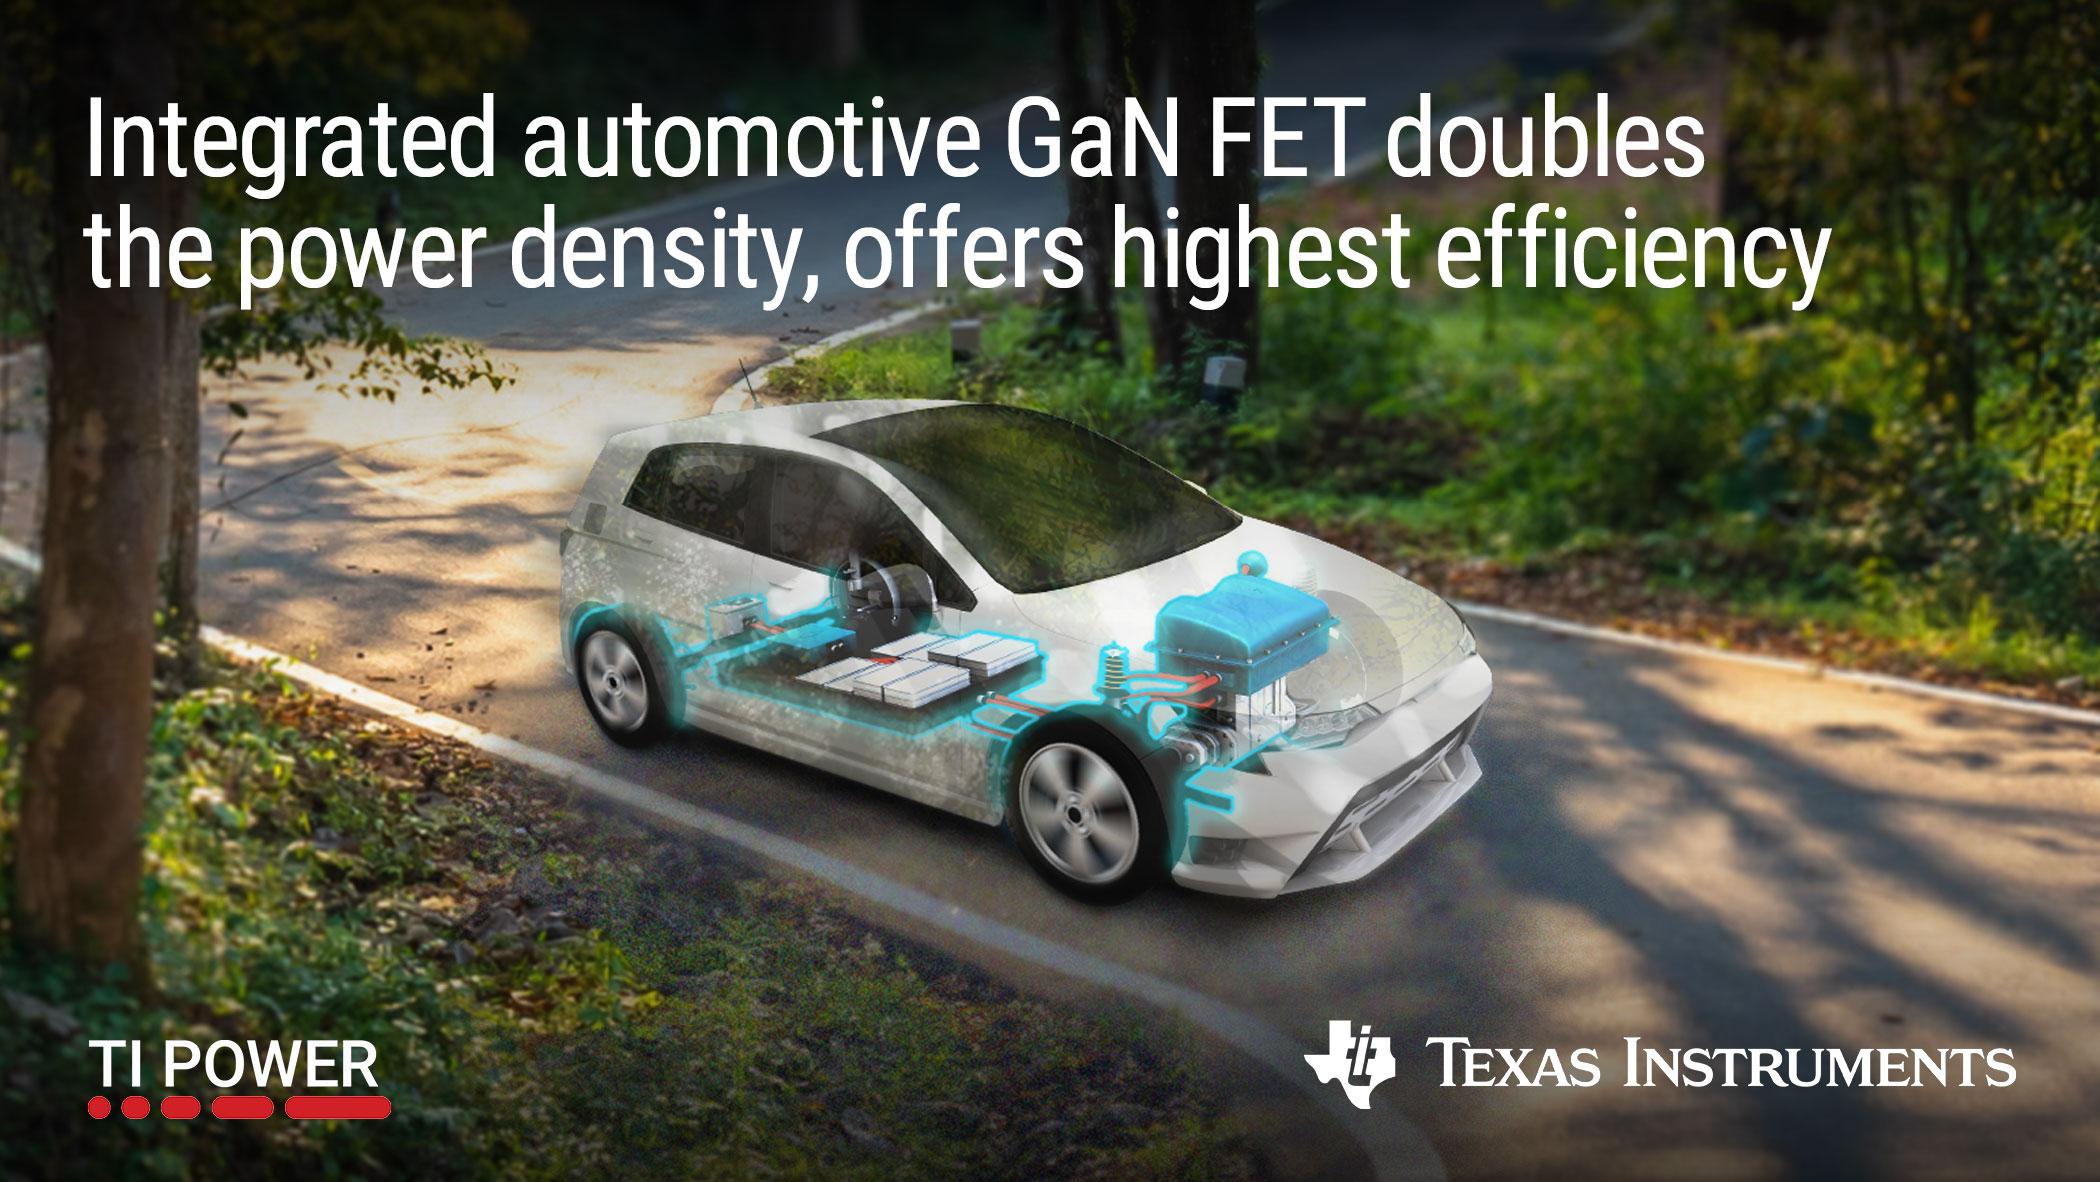 TI首款汽车GaN FET:功率密度翻倍,效率再次提升